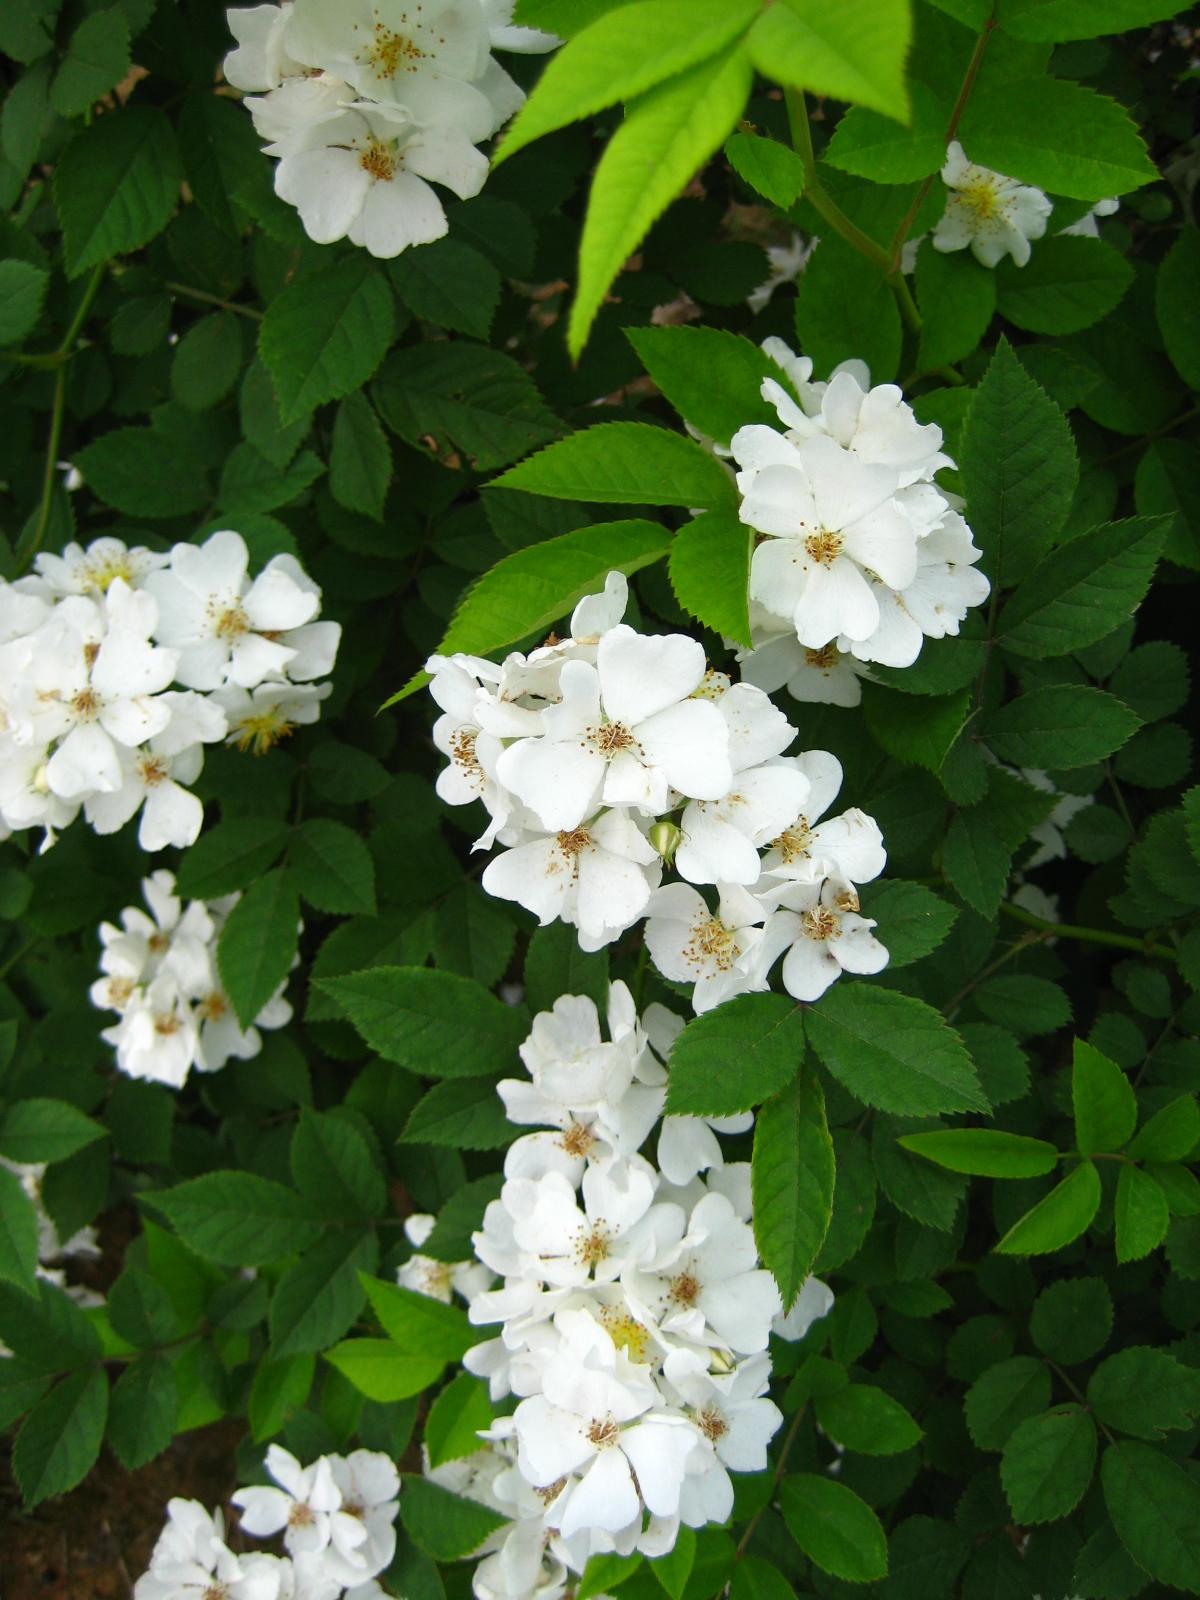 Multiflora Rose Wiktionary